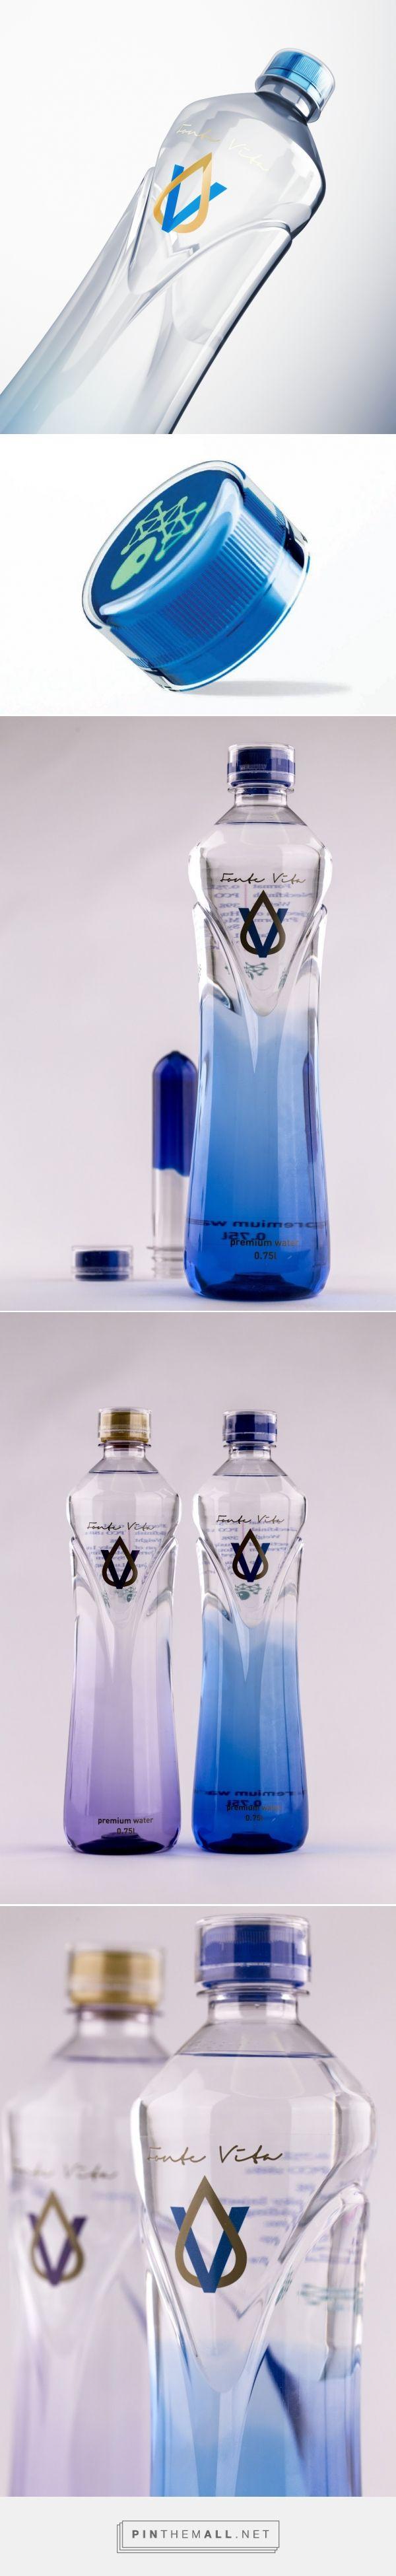 FonteVita PET bottle design by PET Engineering - http://www.packagingoftheworld.com/2017/09/fontevita.html